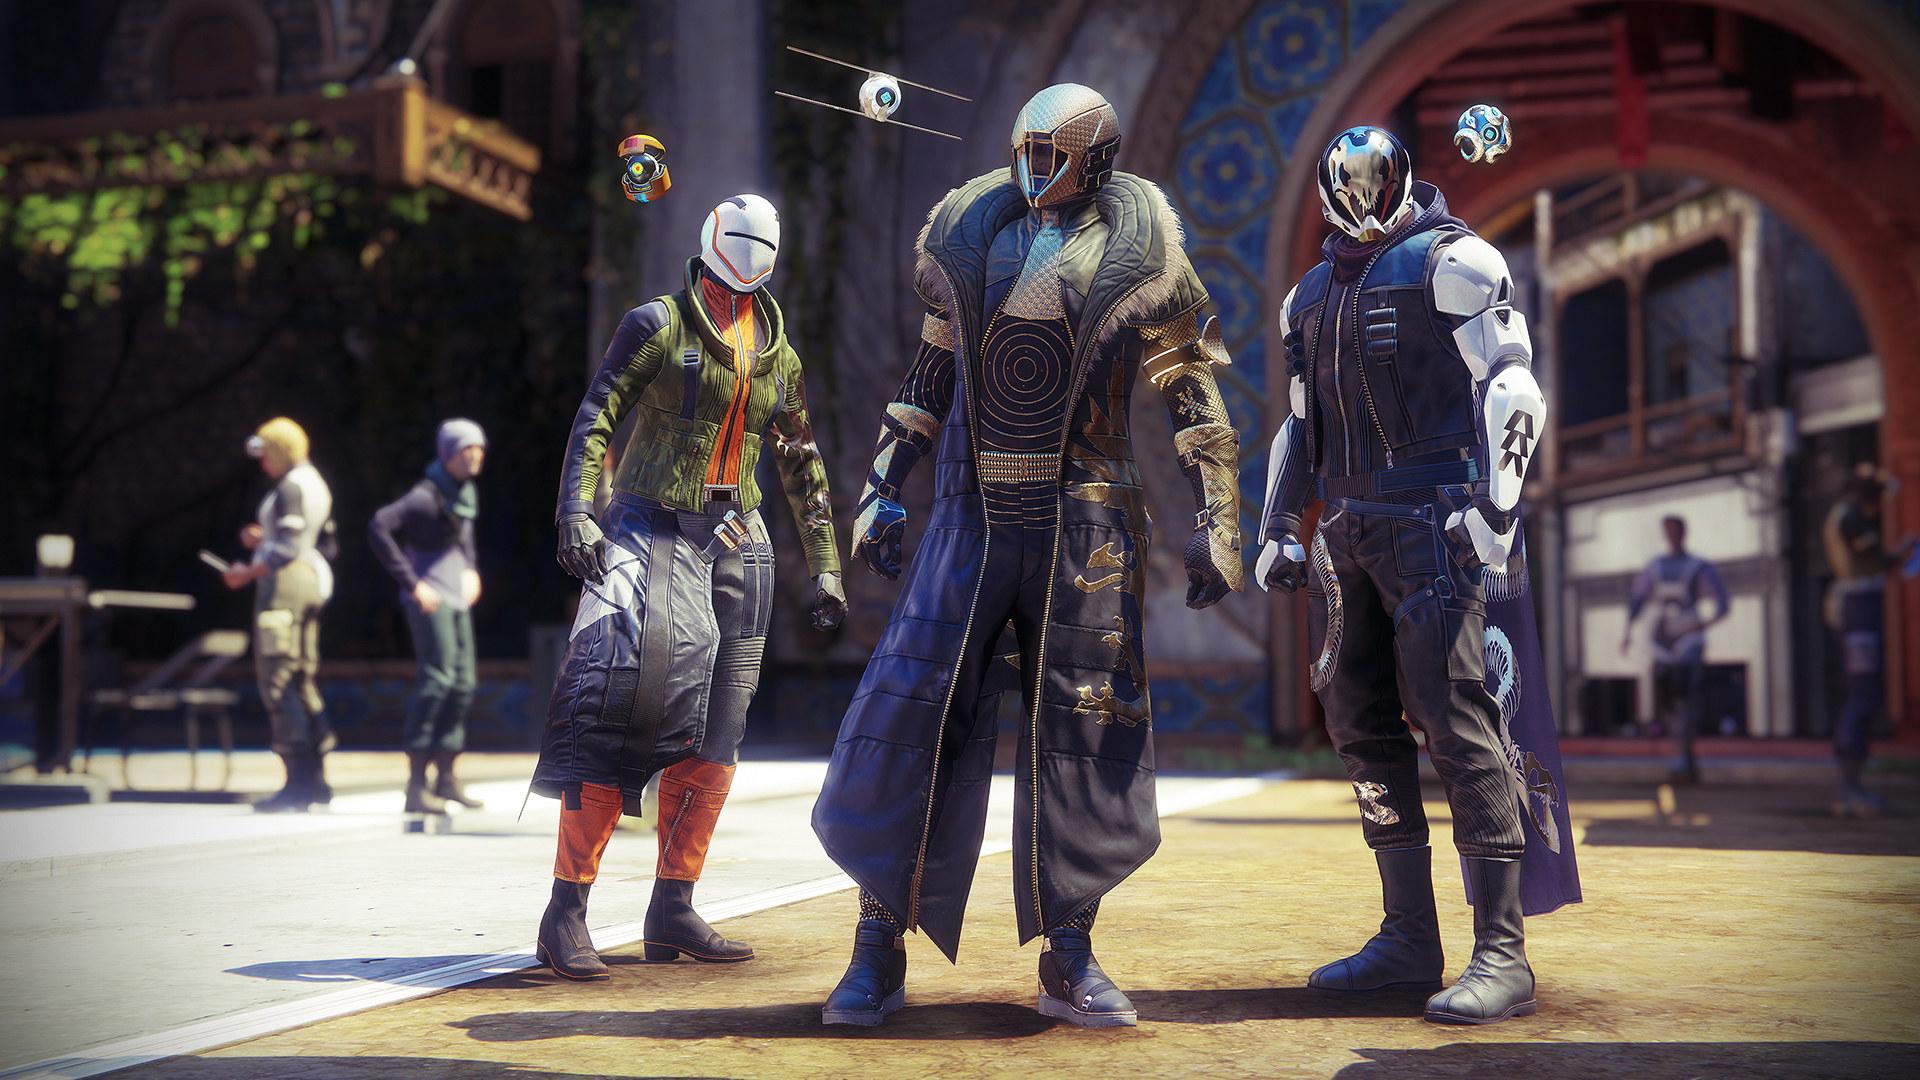 Director details upcoming Destiny 2 transmog system to fans' relief